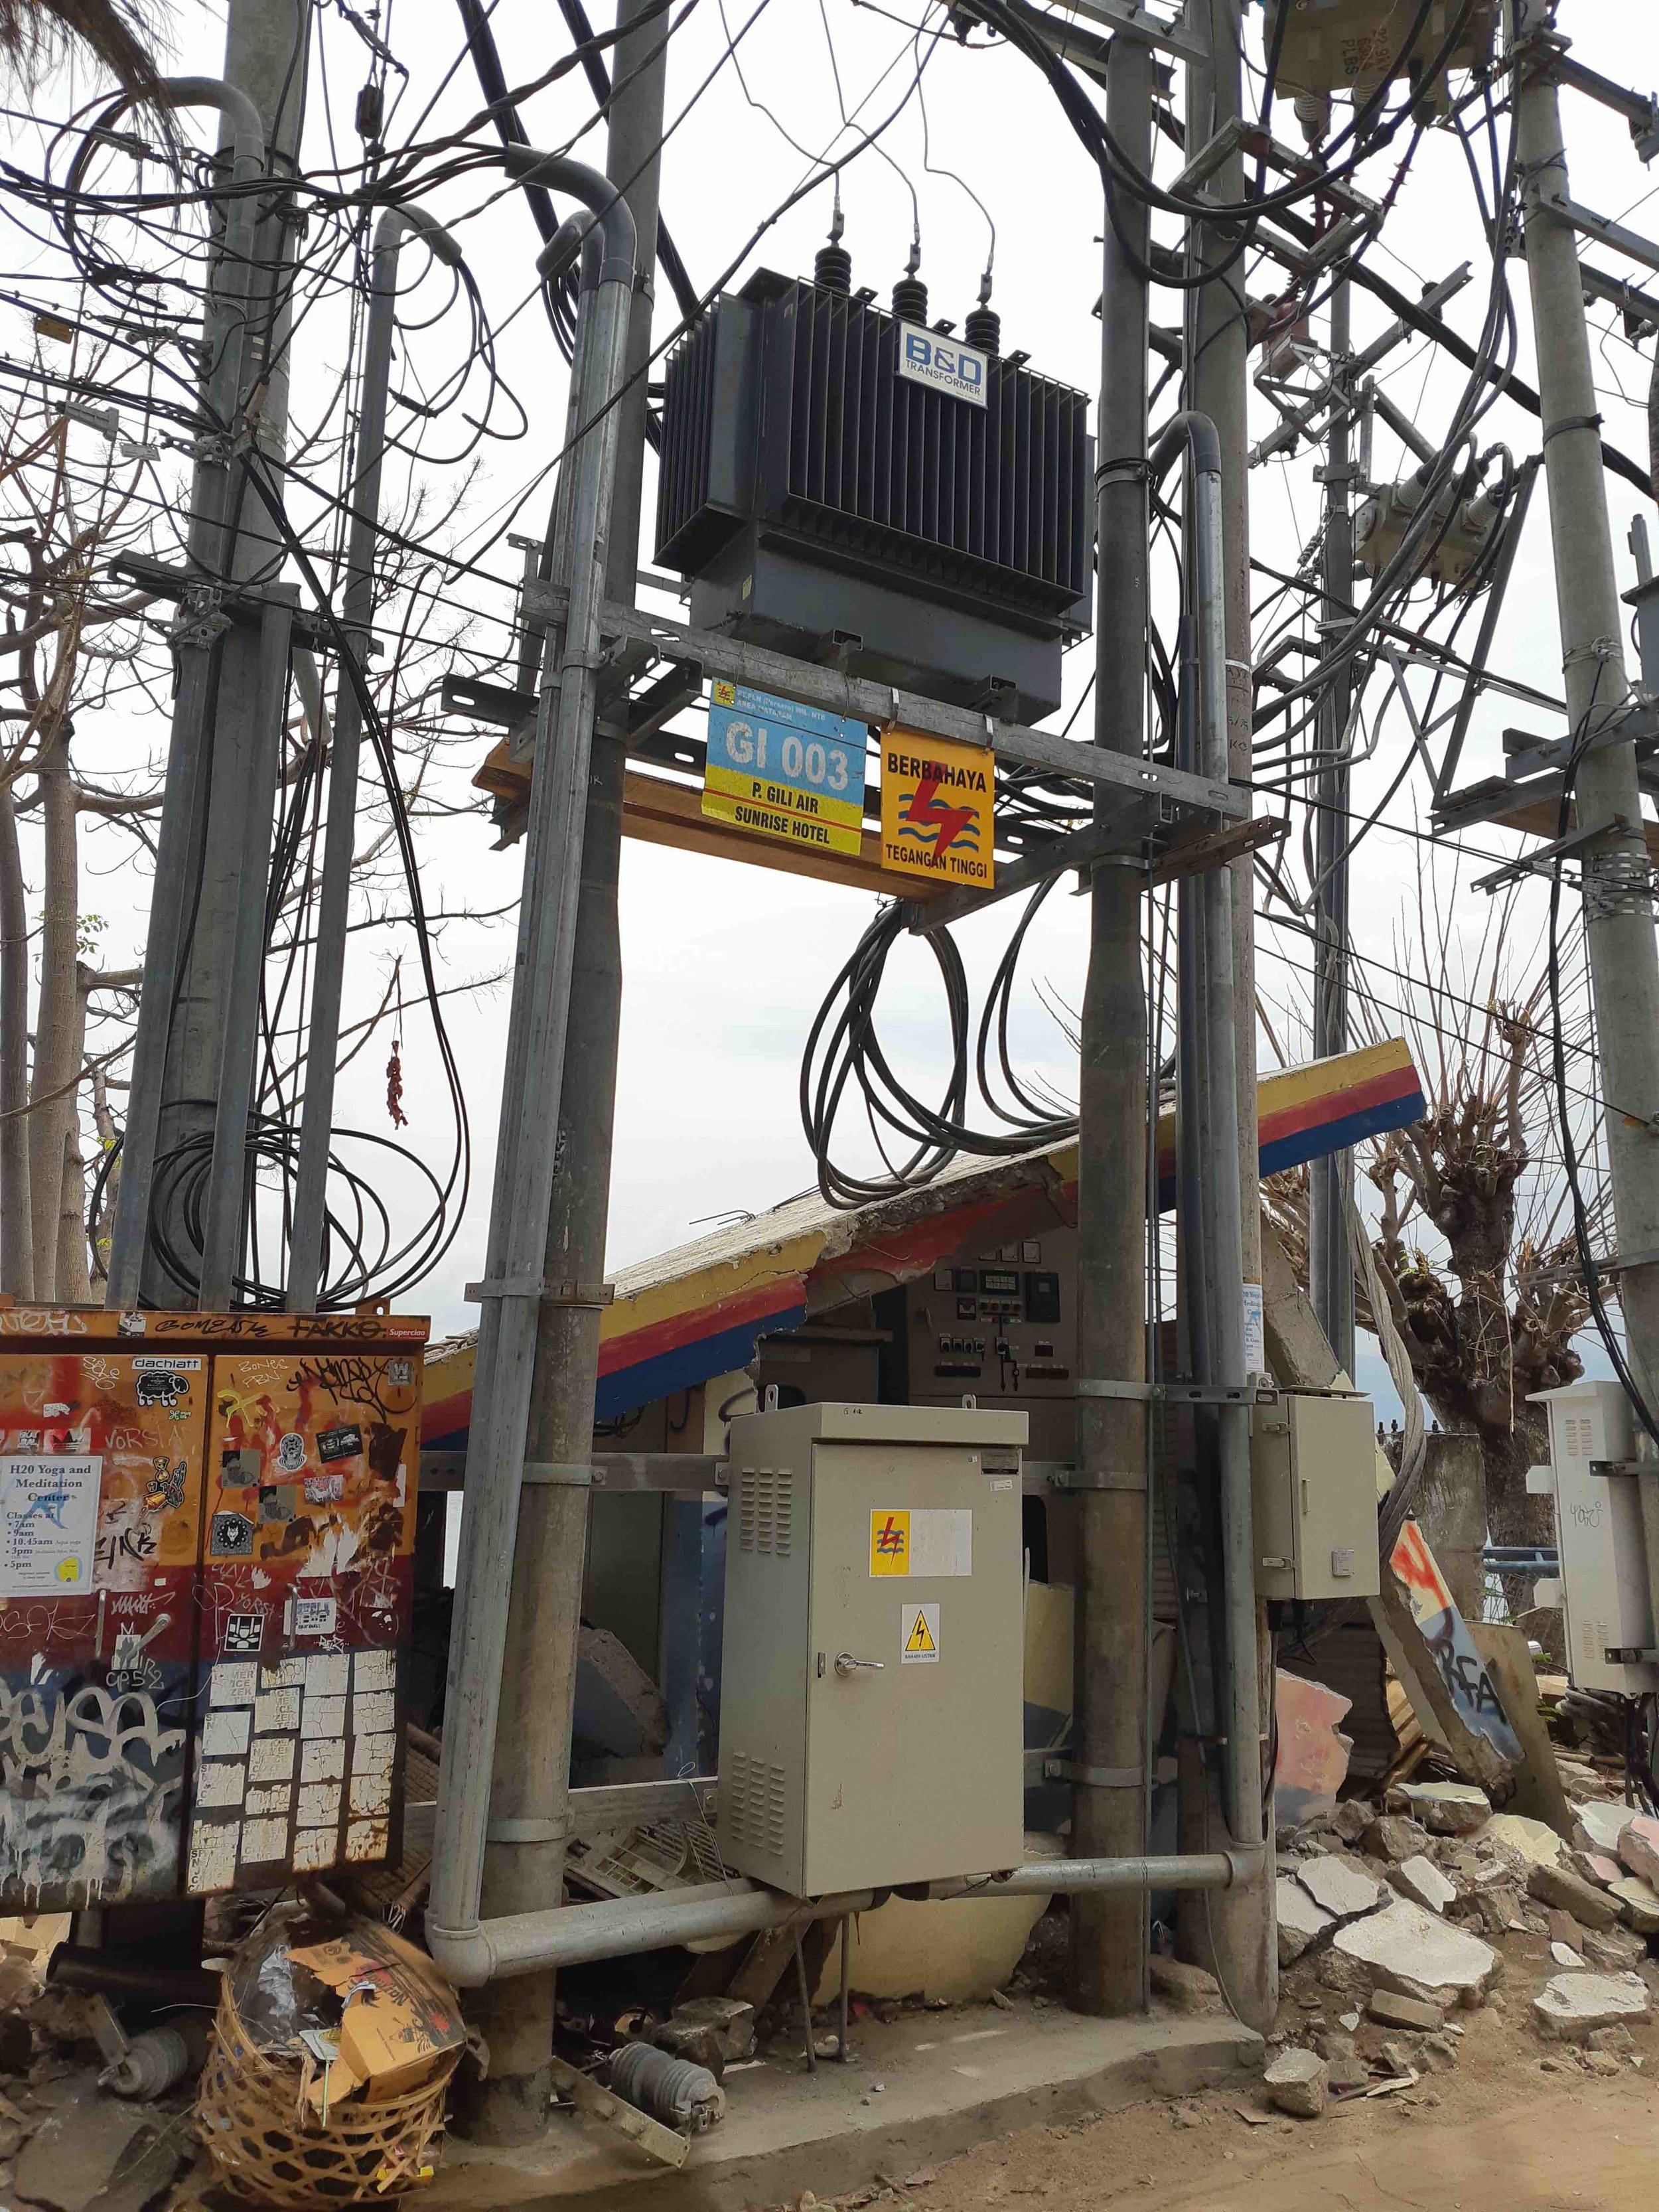 James Buchanan | Electric Chaos